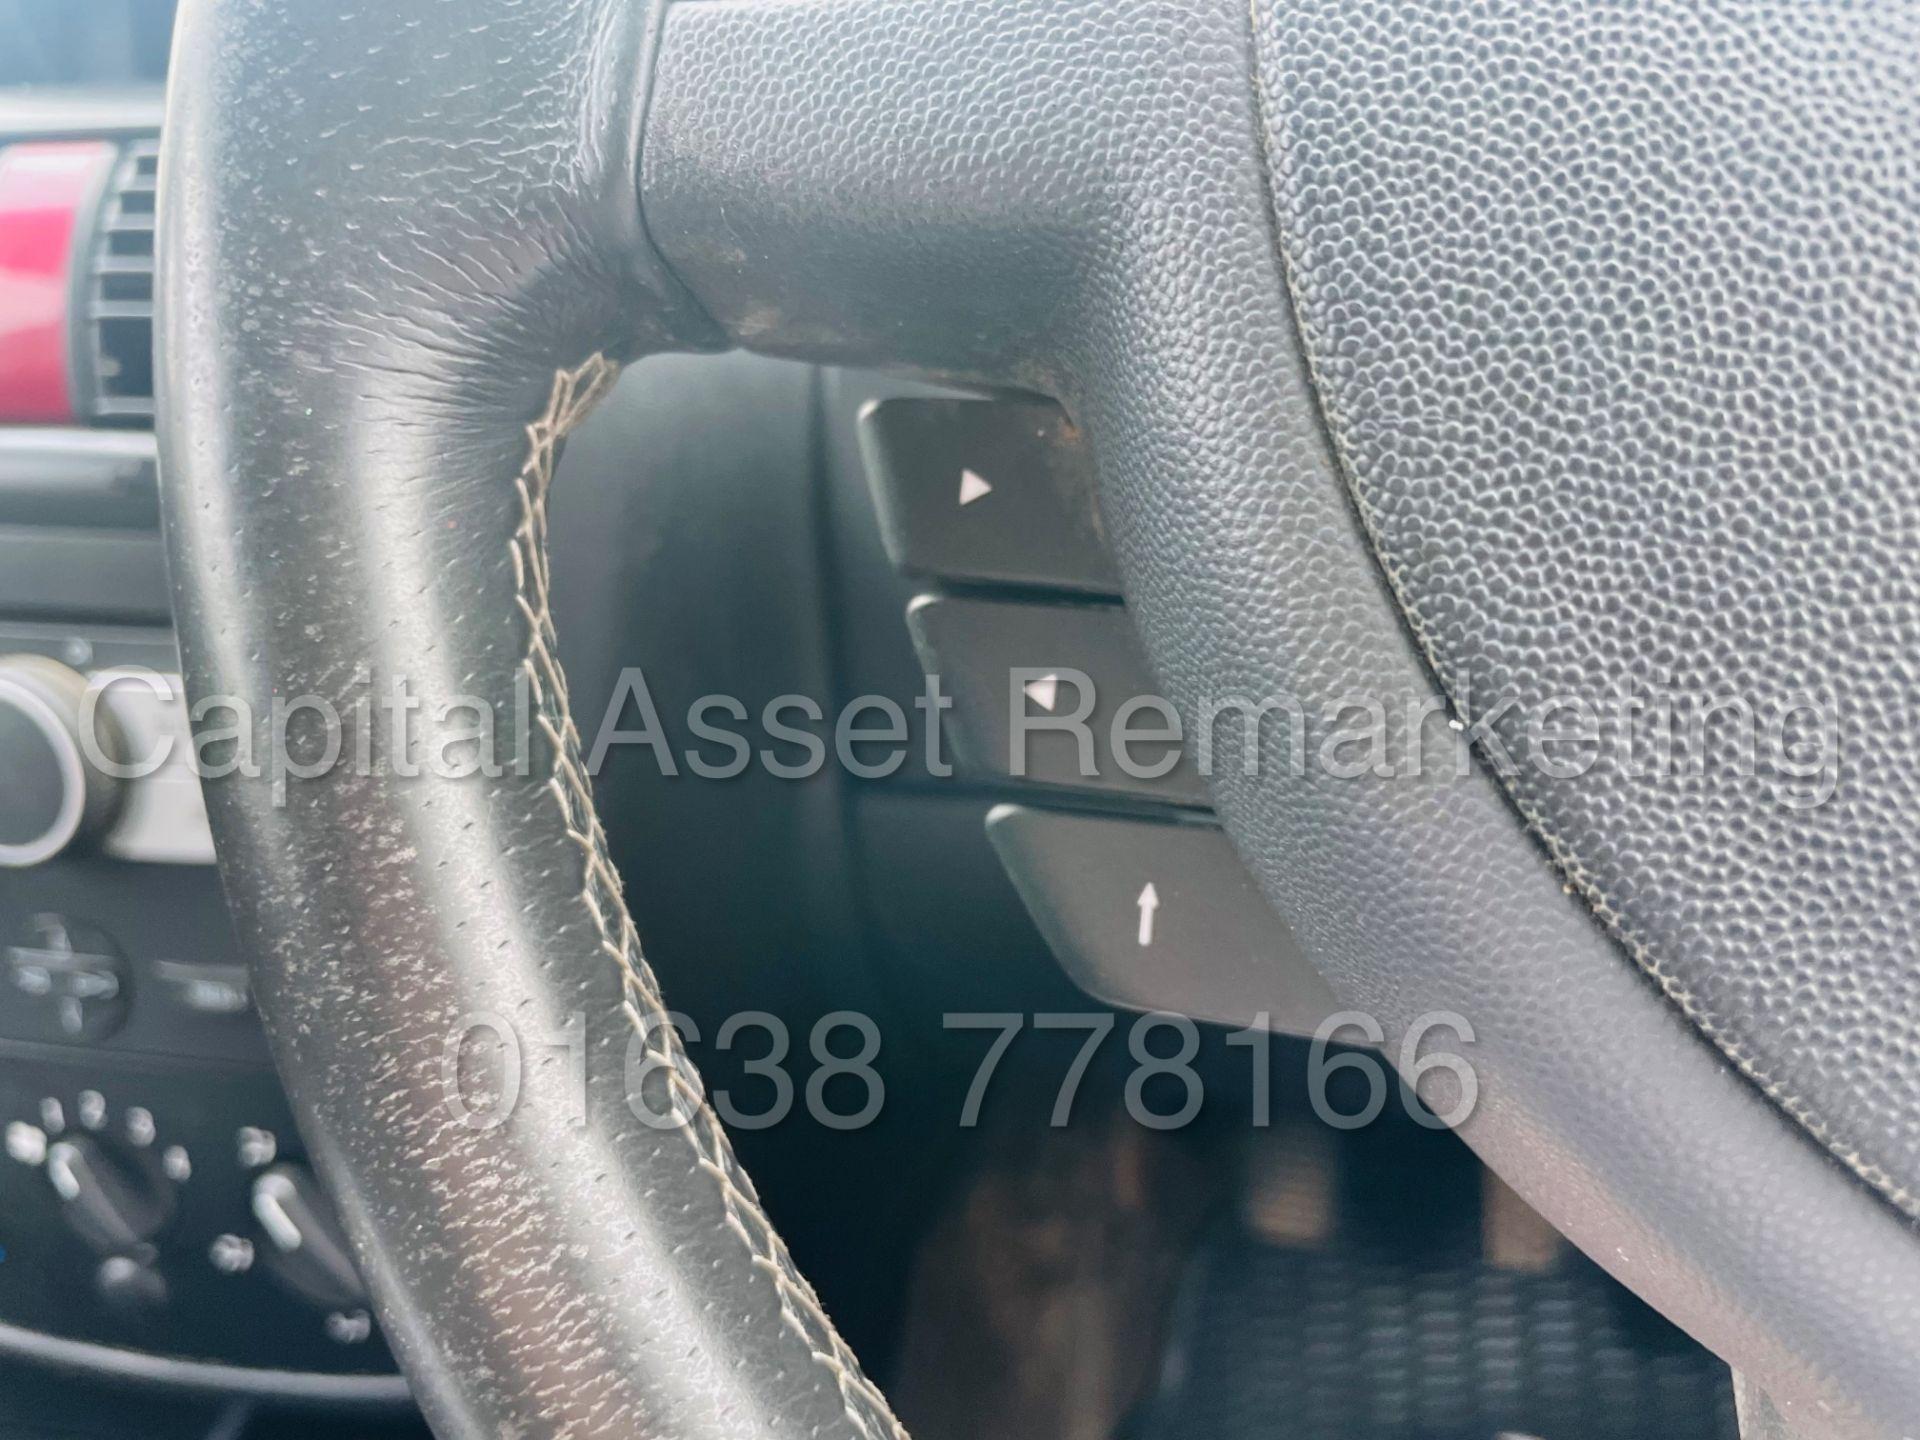 (On Sale) VAUXHALL COMBO CDTI *5 SEATER CREW VAN* (2011 - 11 REG) 'CDTI - 5 SPEED' (1 FORMER KEEPER) - Image 41 of 44